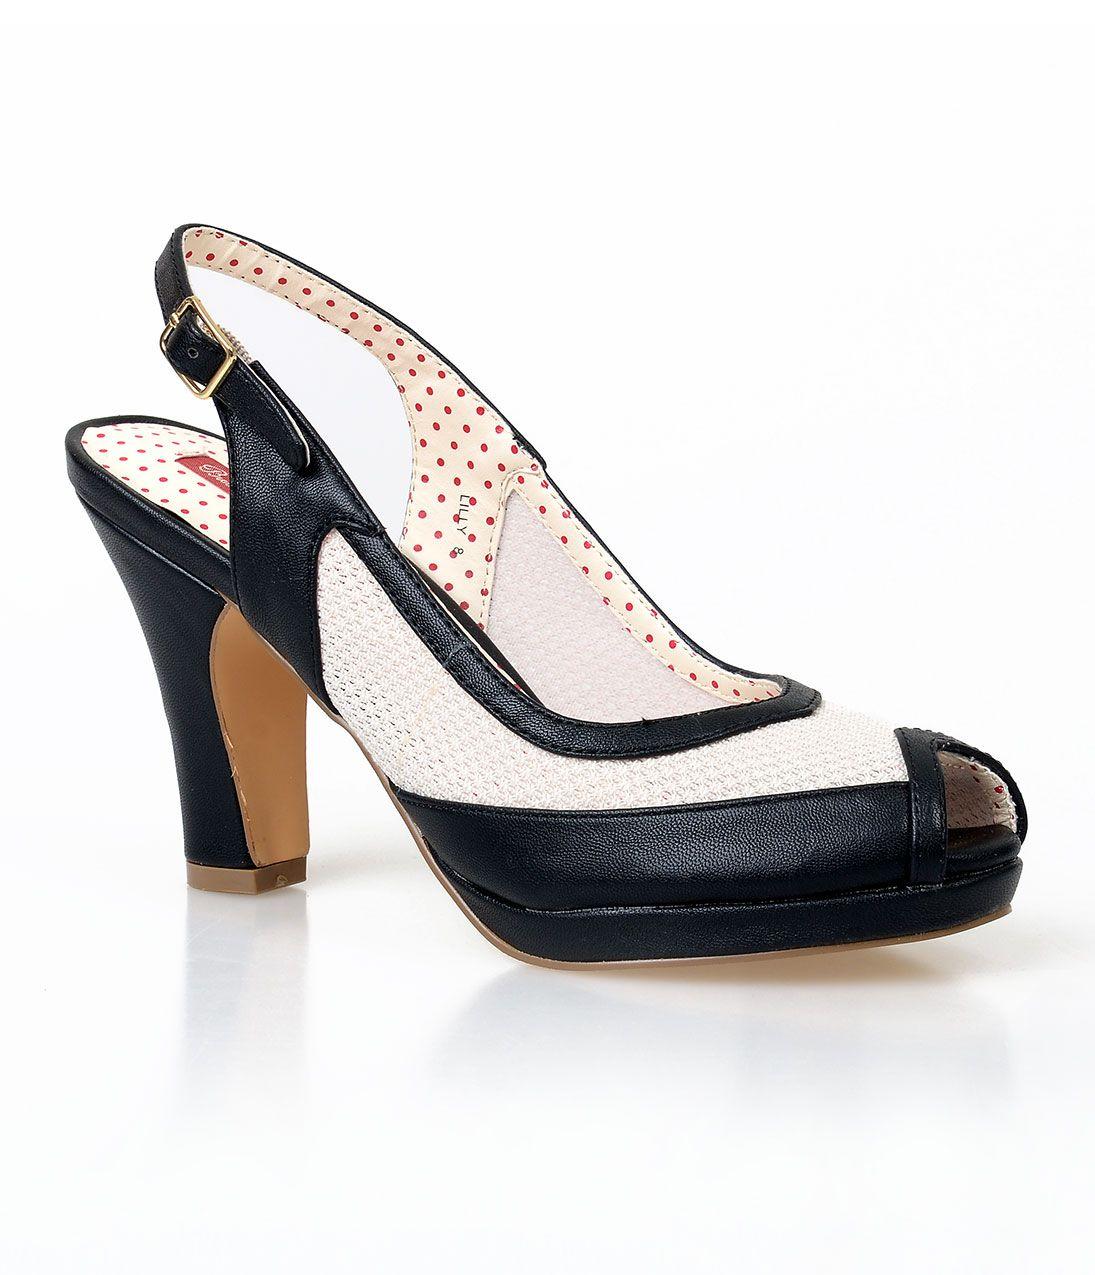 peep toe pumps, Black high heel pumps